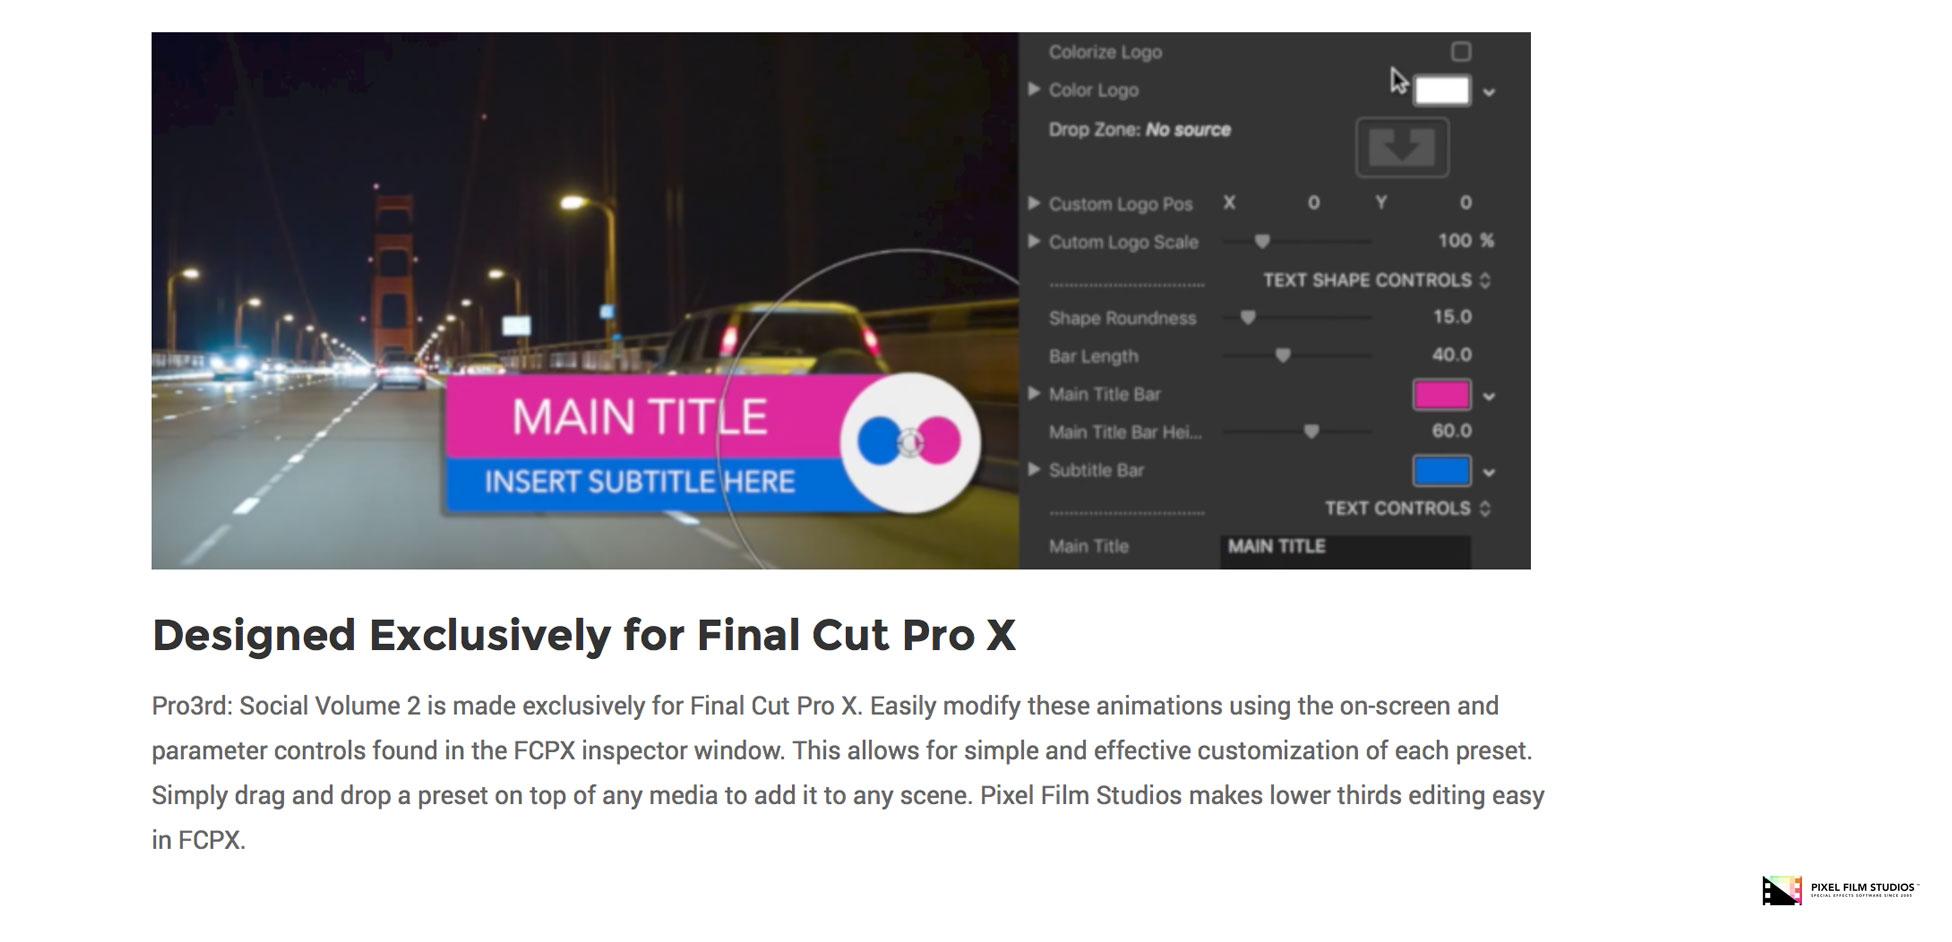 Pixel Film Studios Set to Release Pro3rd Social Volume 2 for